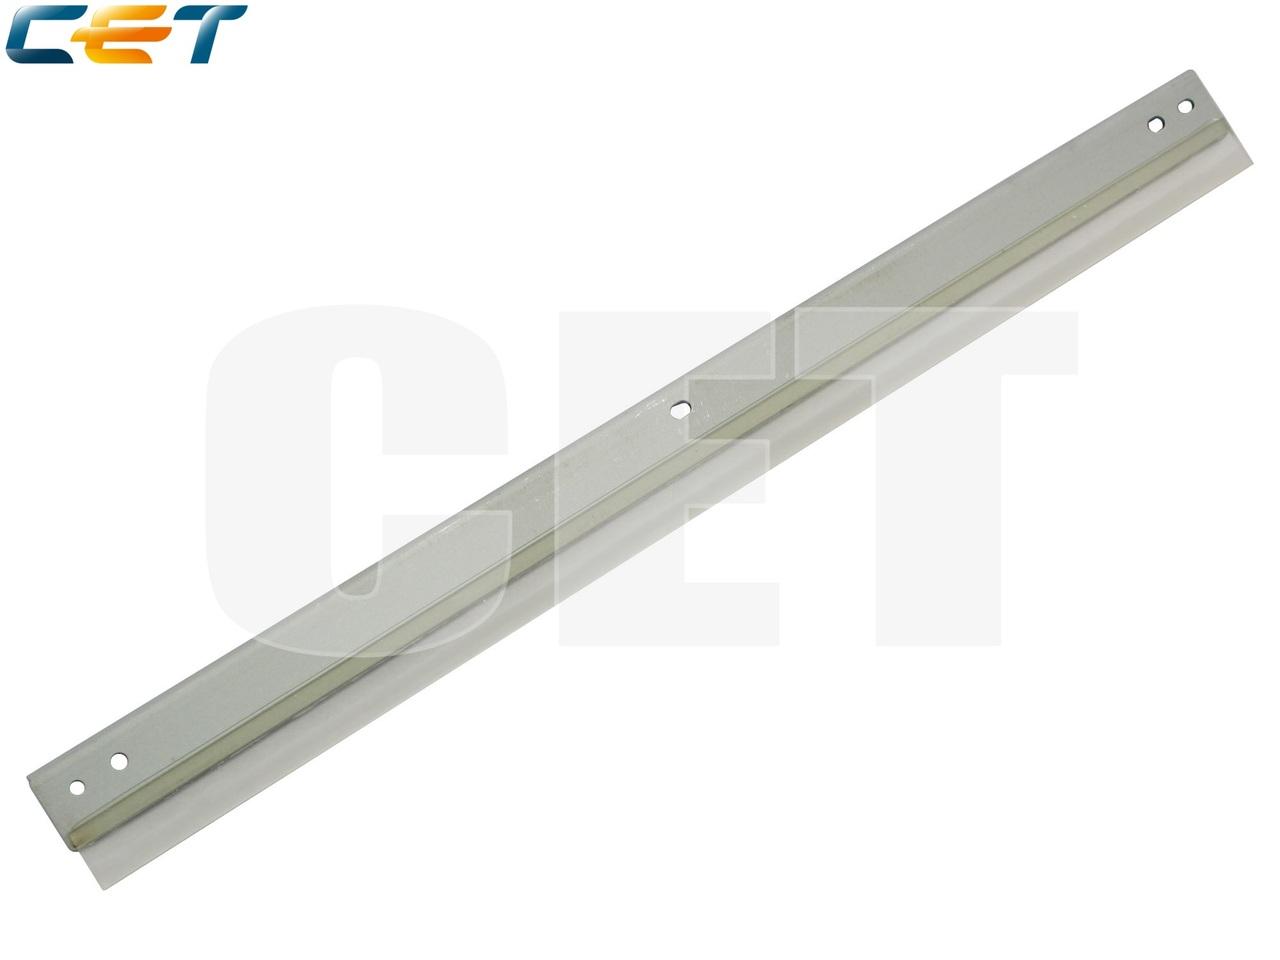 Ракель 2C918010, 2FT18010 для KYOCERAKM-1620/1650/2050/2550/1635/2035, TASKalfa 180/181/220/221(CET), CET4599N